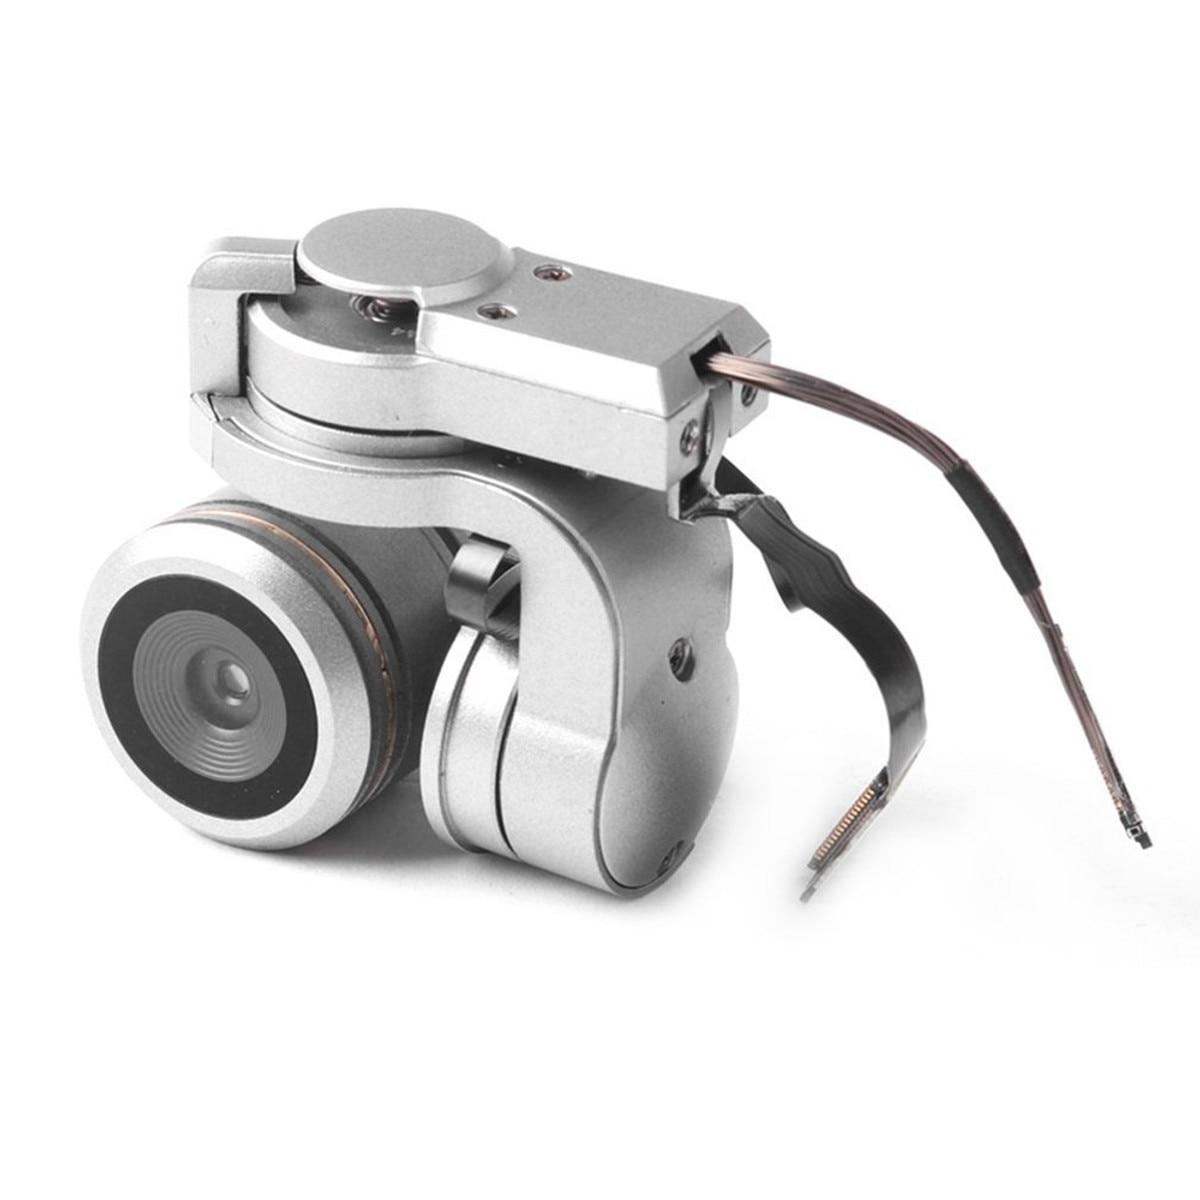 Replacement Repair Parts For DJI Mavic Pro Gimbal Camera Lens FPV HD 4K For DJI Mavic Pro Camera Mavic Gimbal Accessories